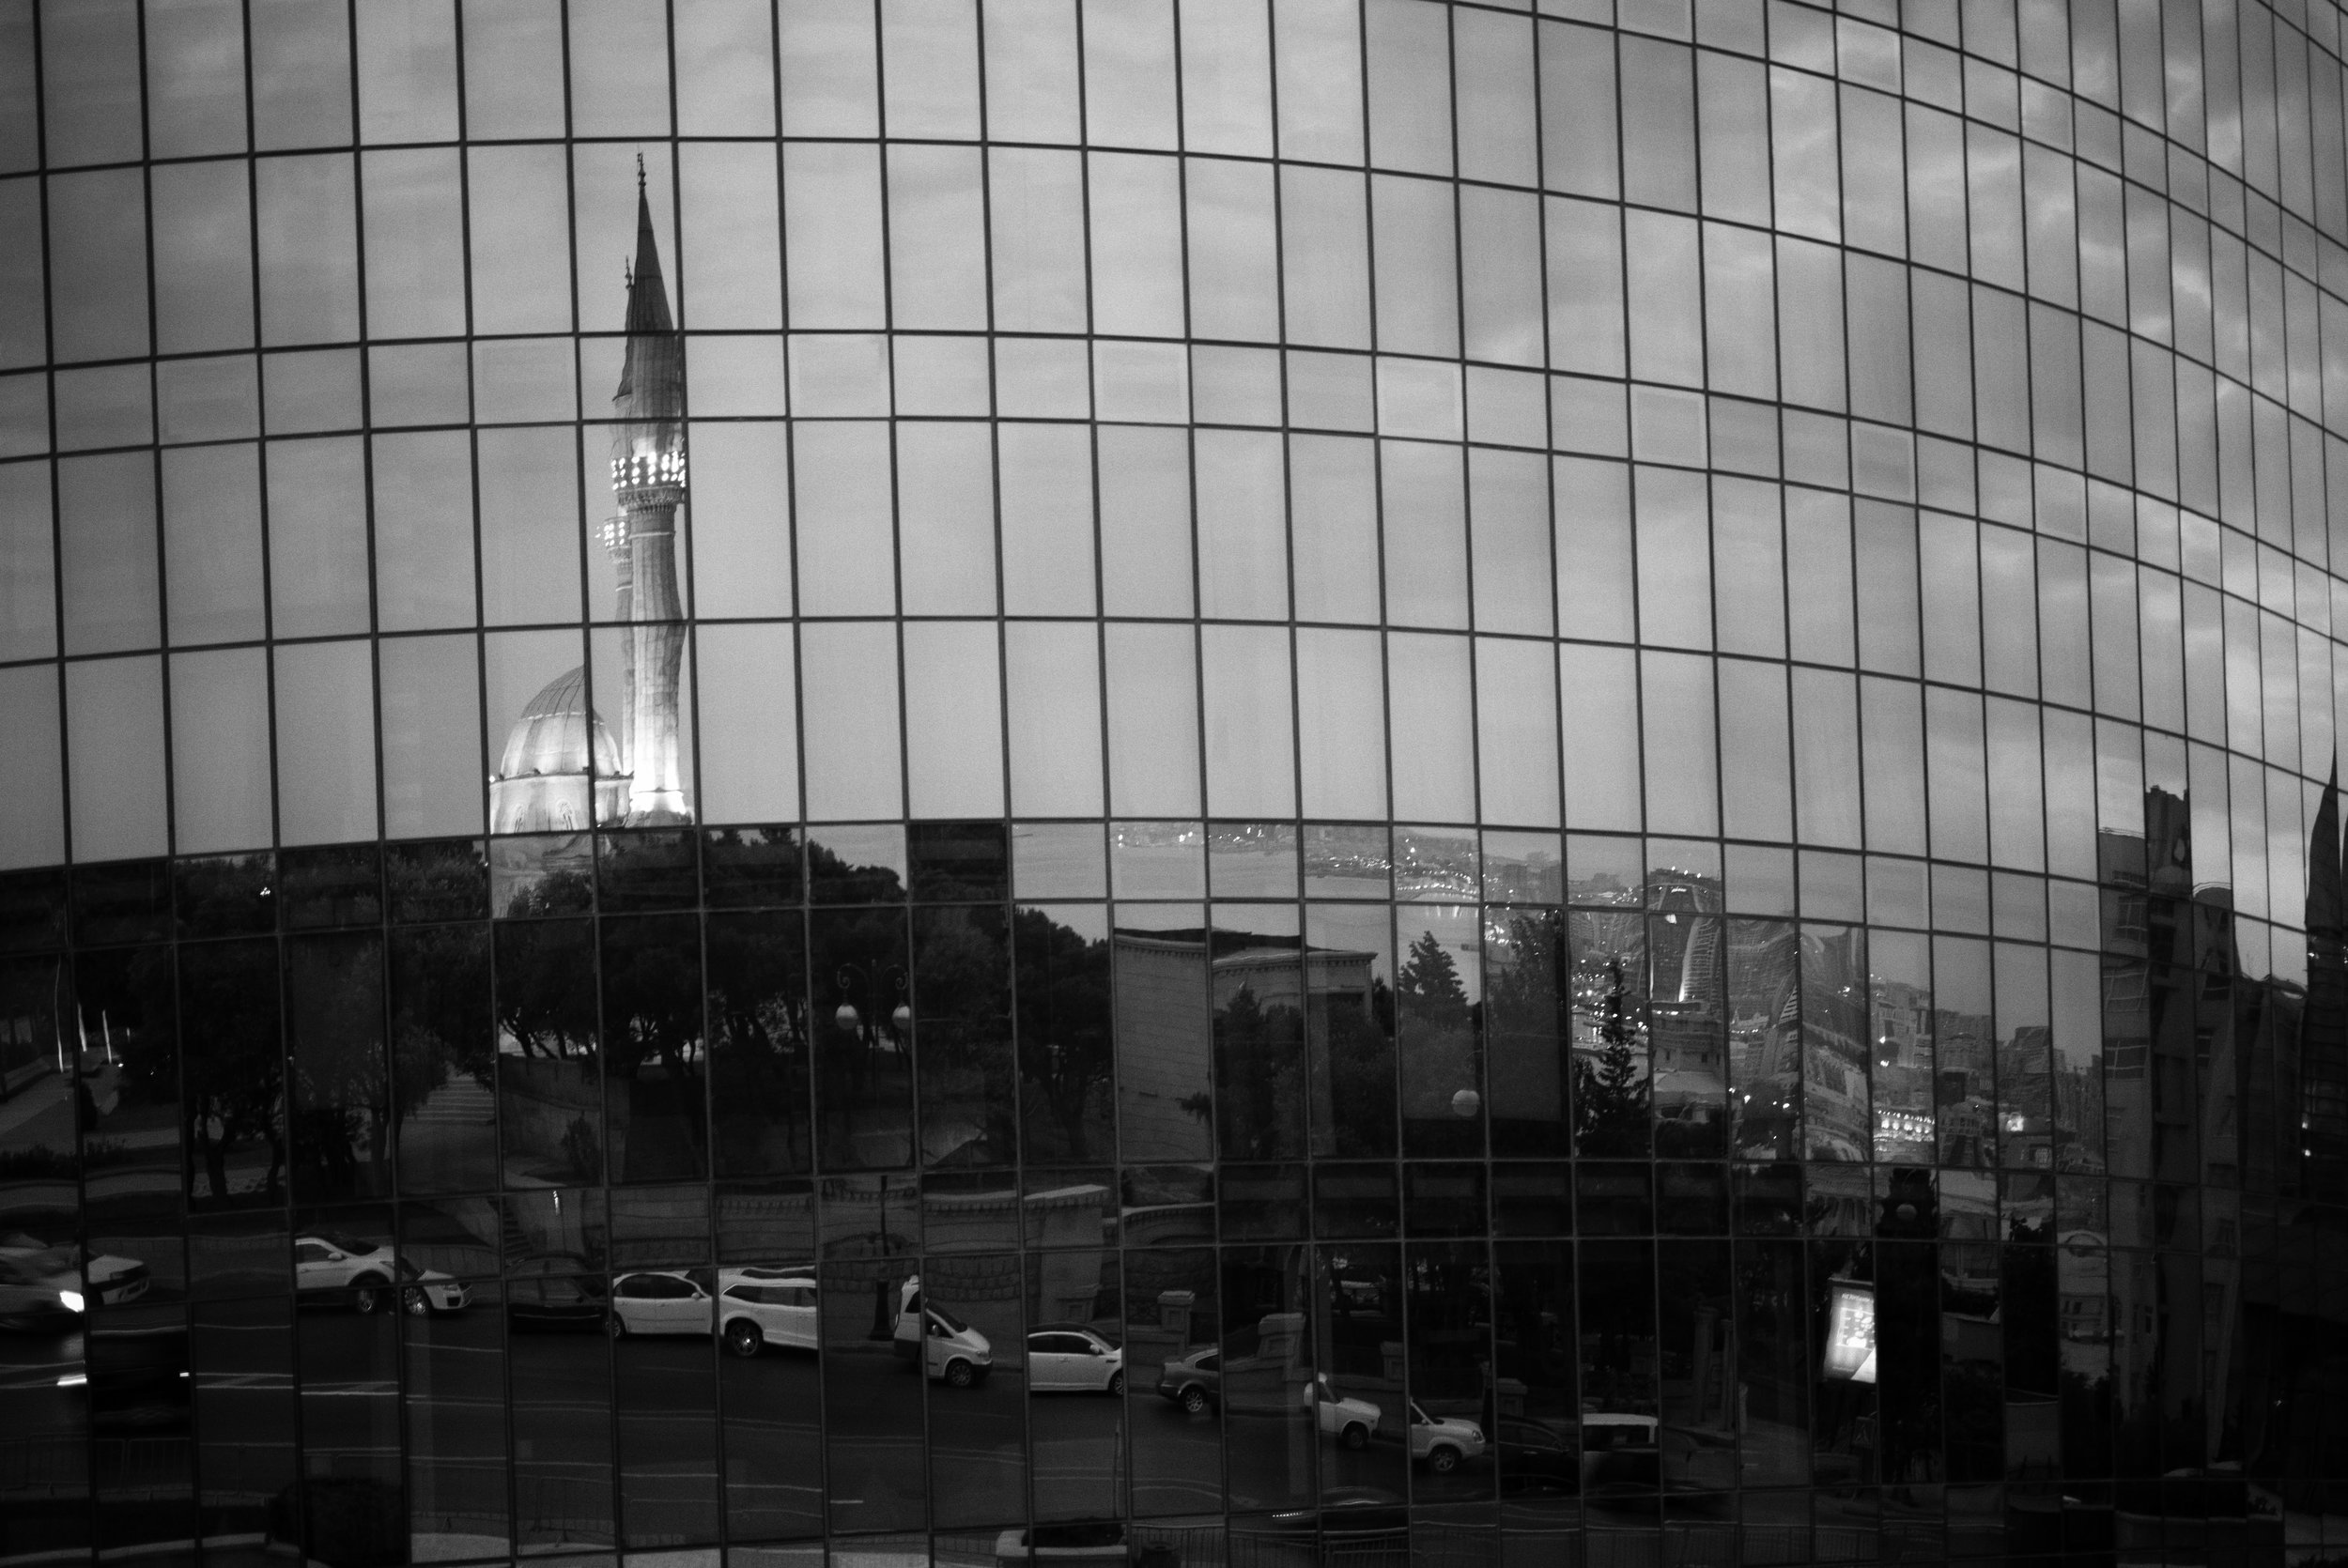 Reflections in a flame Baku, Azerbaijan Leica M (Typ 246) 50mm f/2.0 APO Summicron © Keith R. Sbiral, 2018